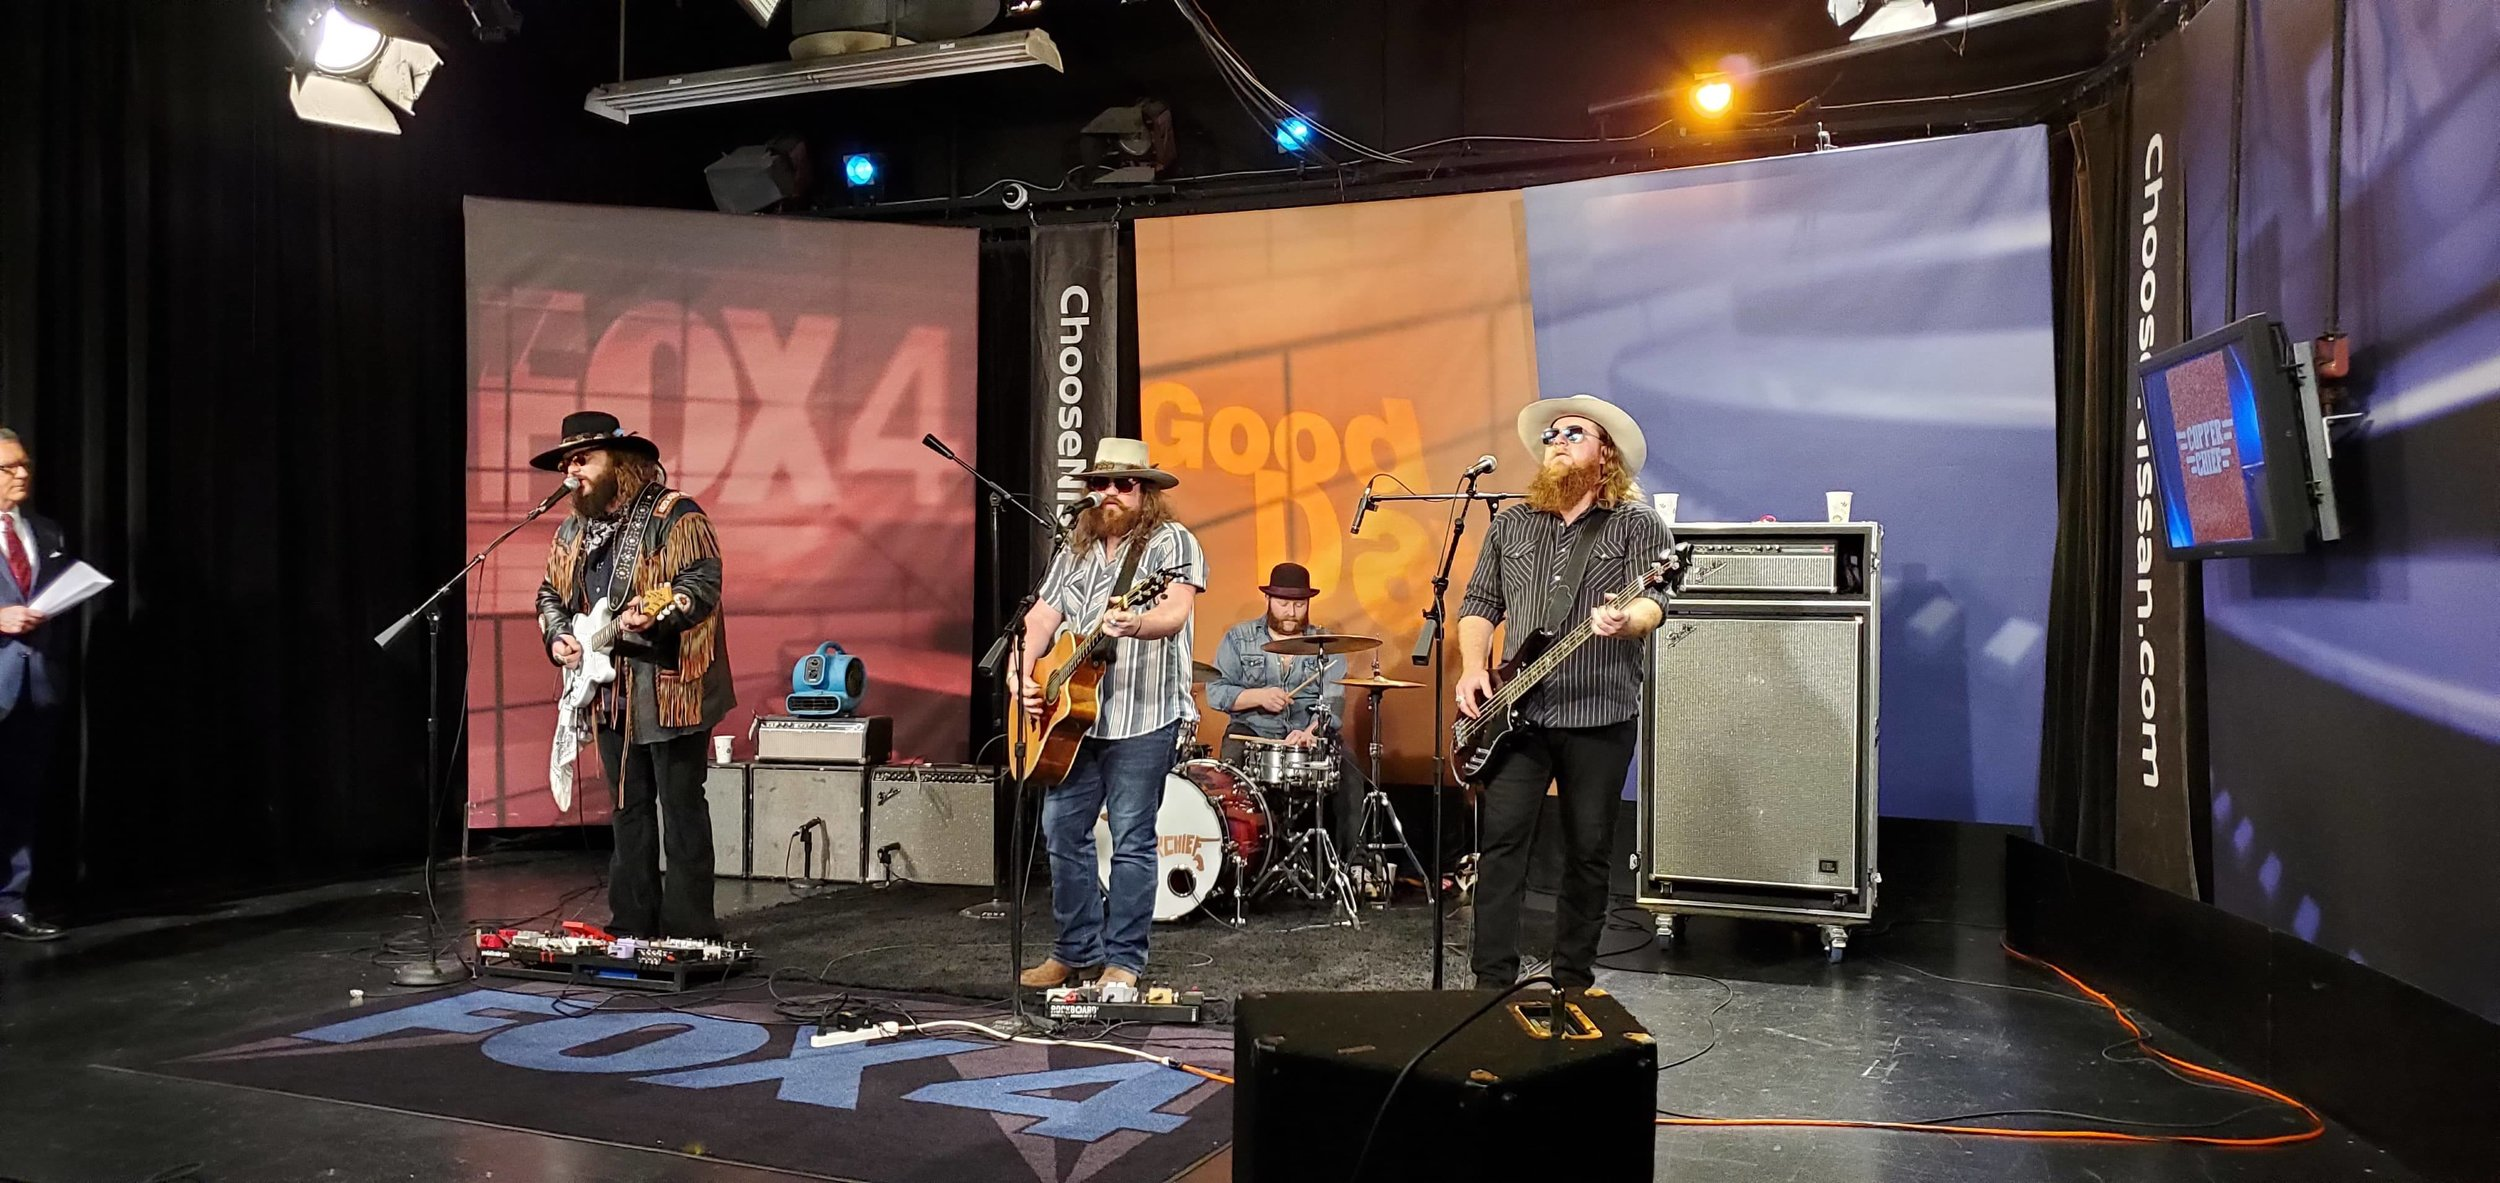 Copper Chief on Fox 4 Good Day KDFW - Dallas, TX